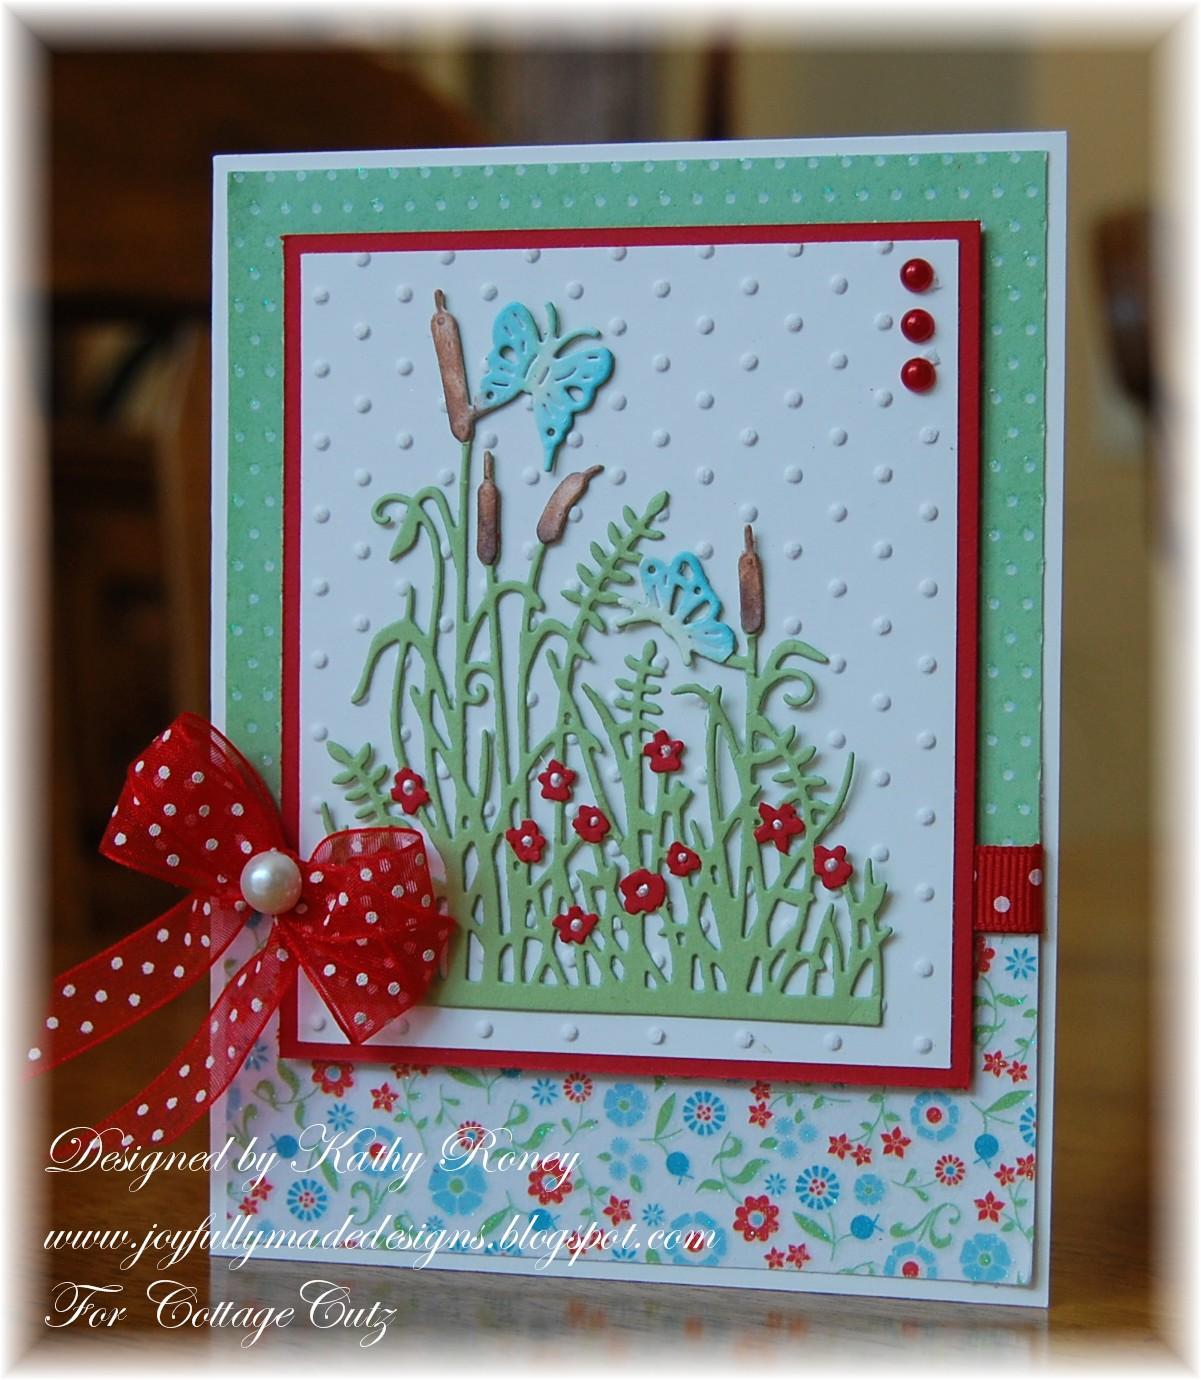 CottageBLOG: Fancy Cattails & Butterflies